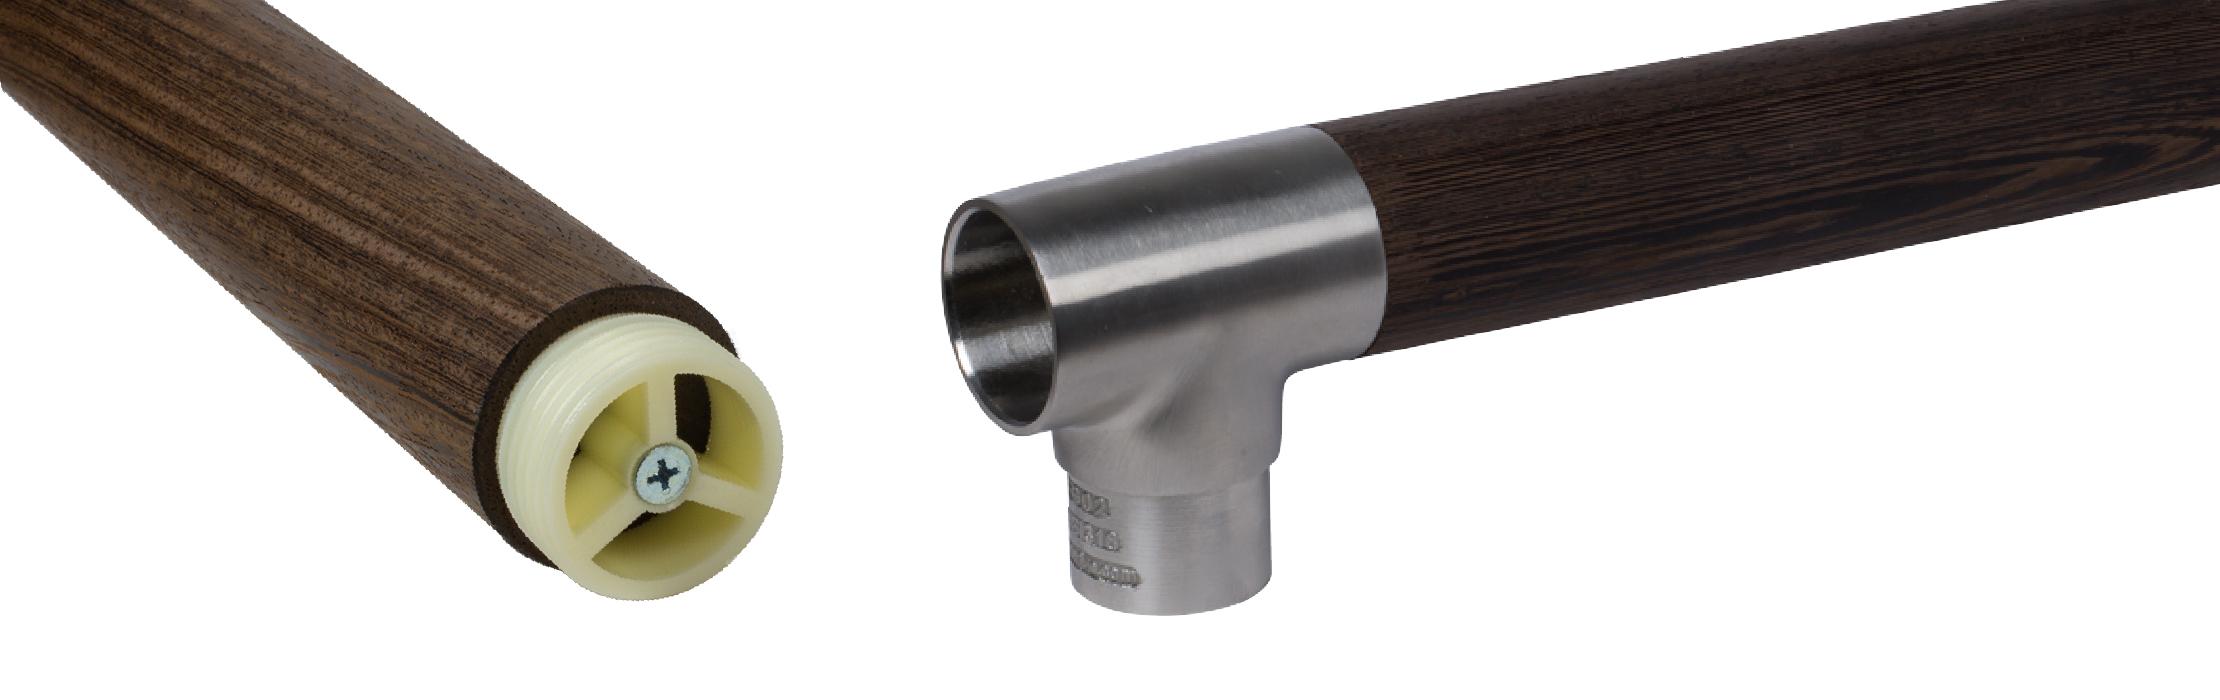 modern wood handrail